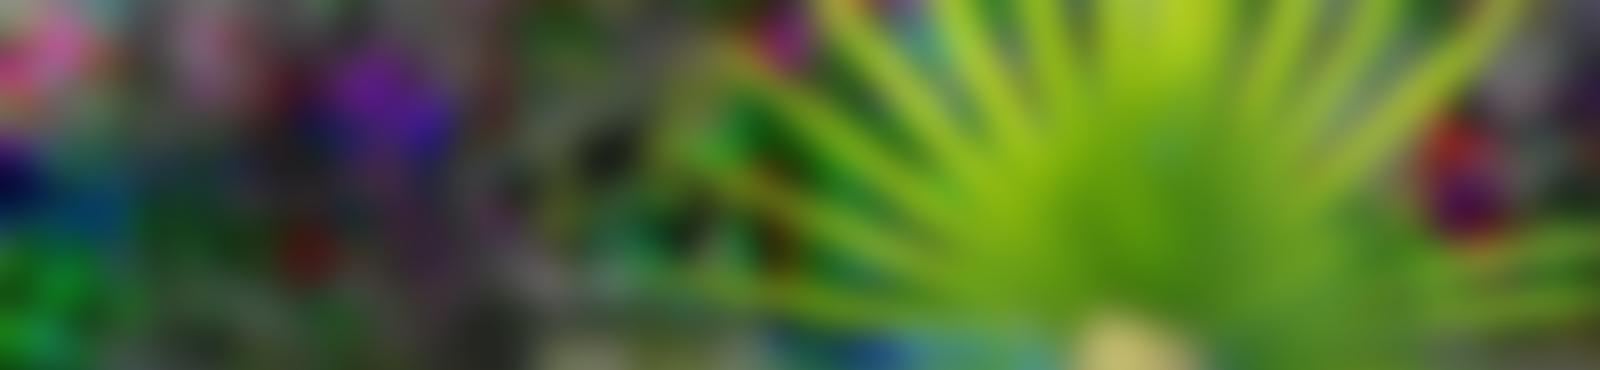 Blurred 1e079c79 c231 4f2d 97c9 7eb6aeea60f9